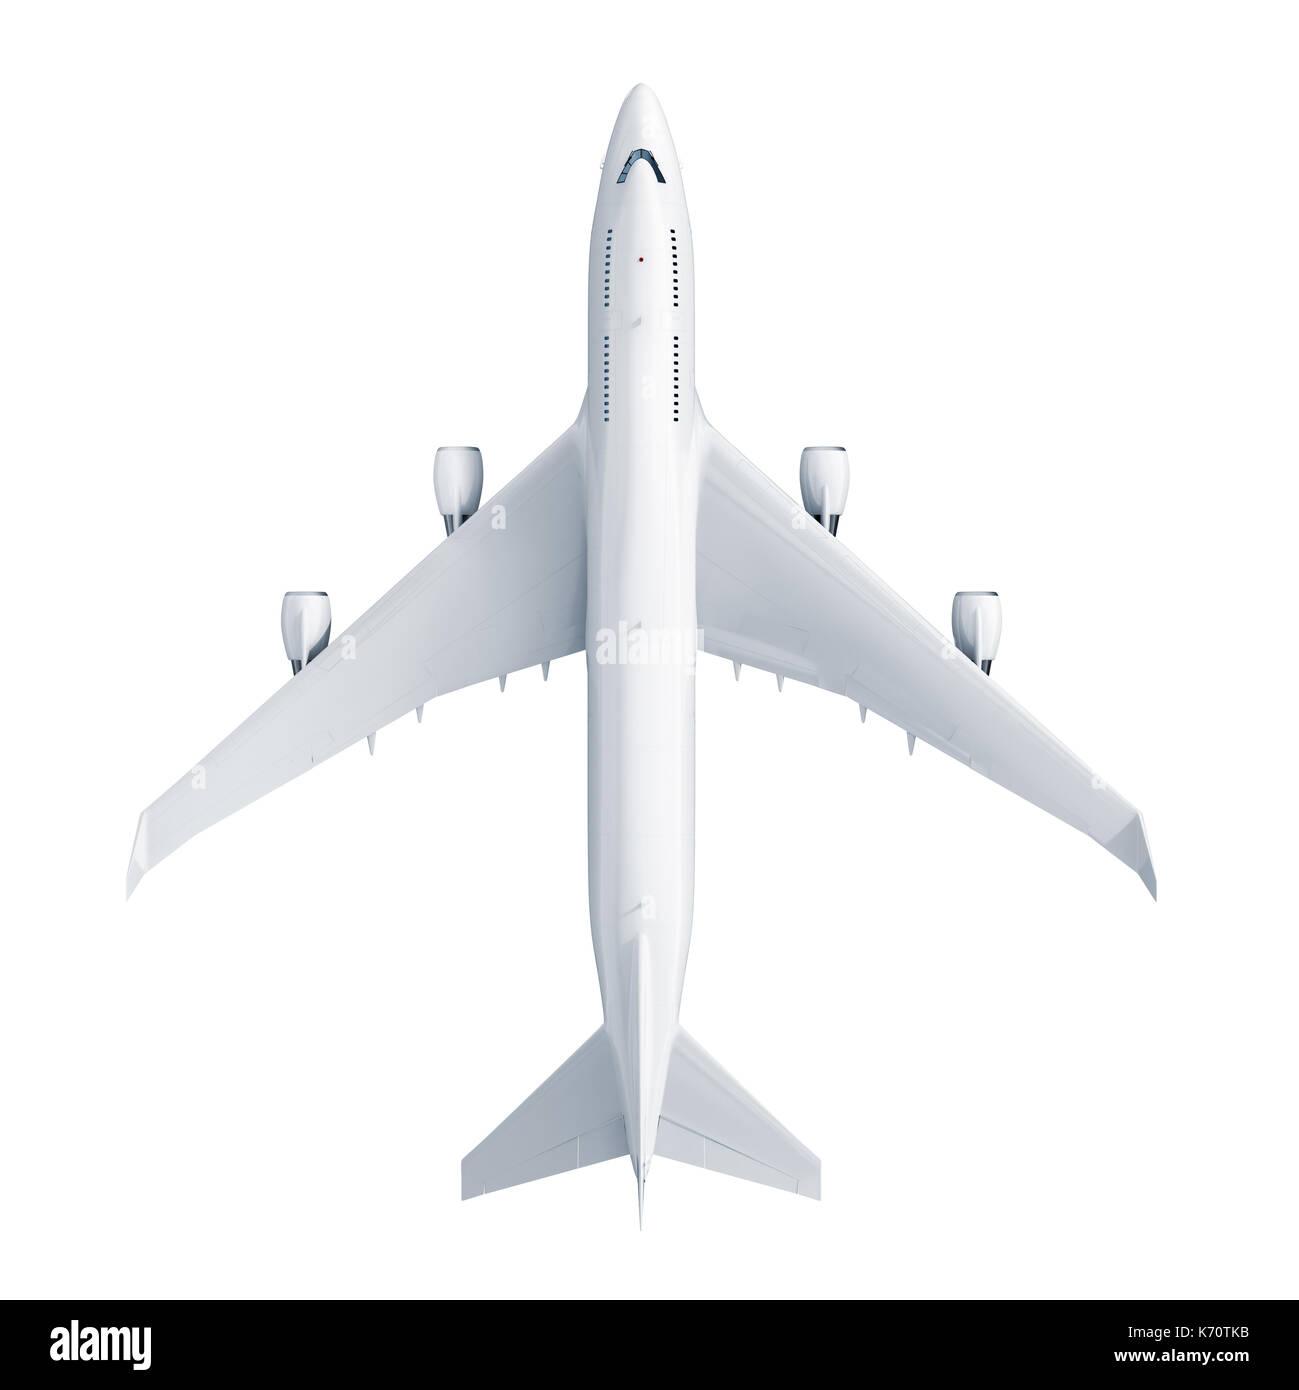 Airplane isolated on white background - Stock Image